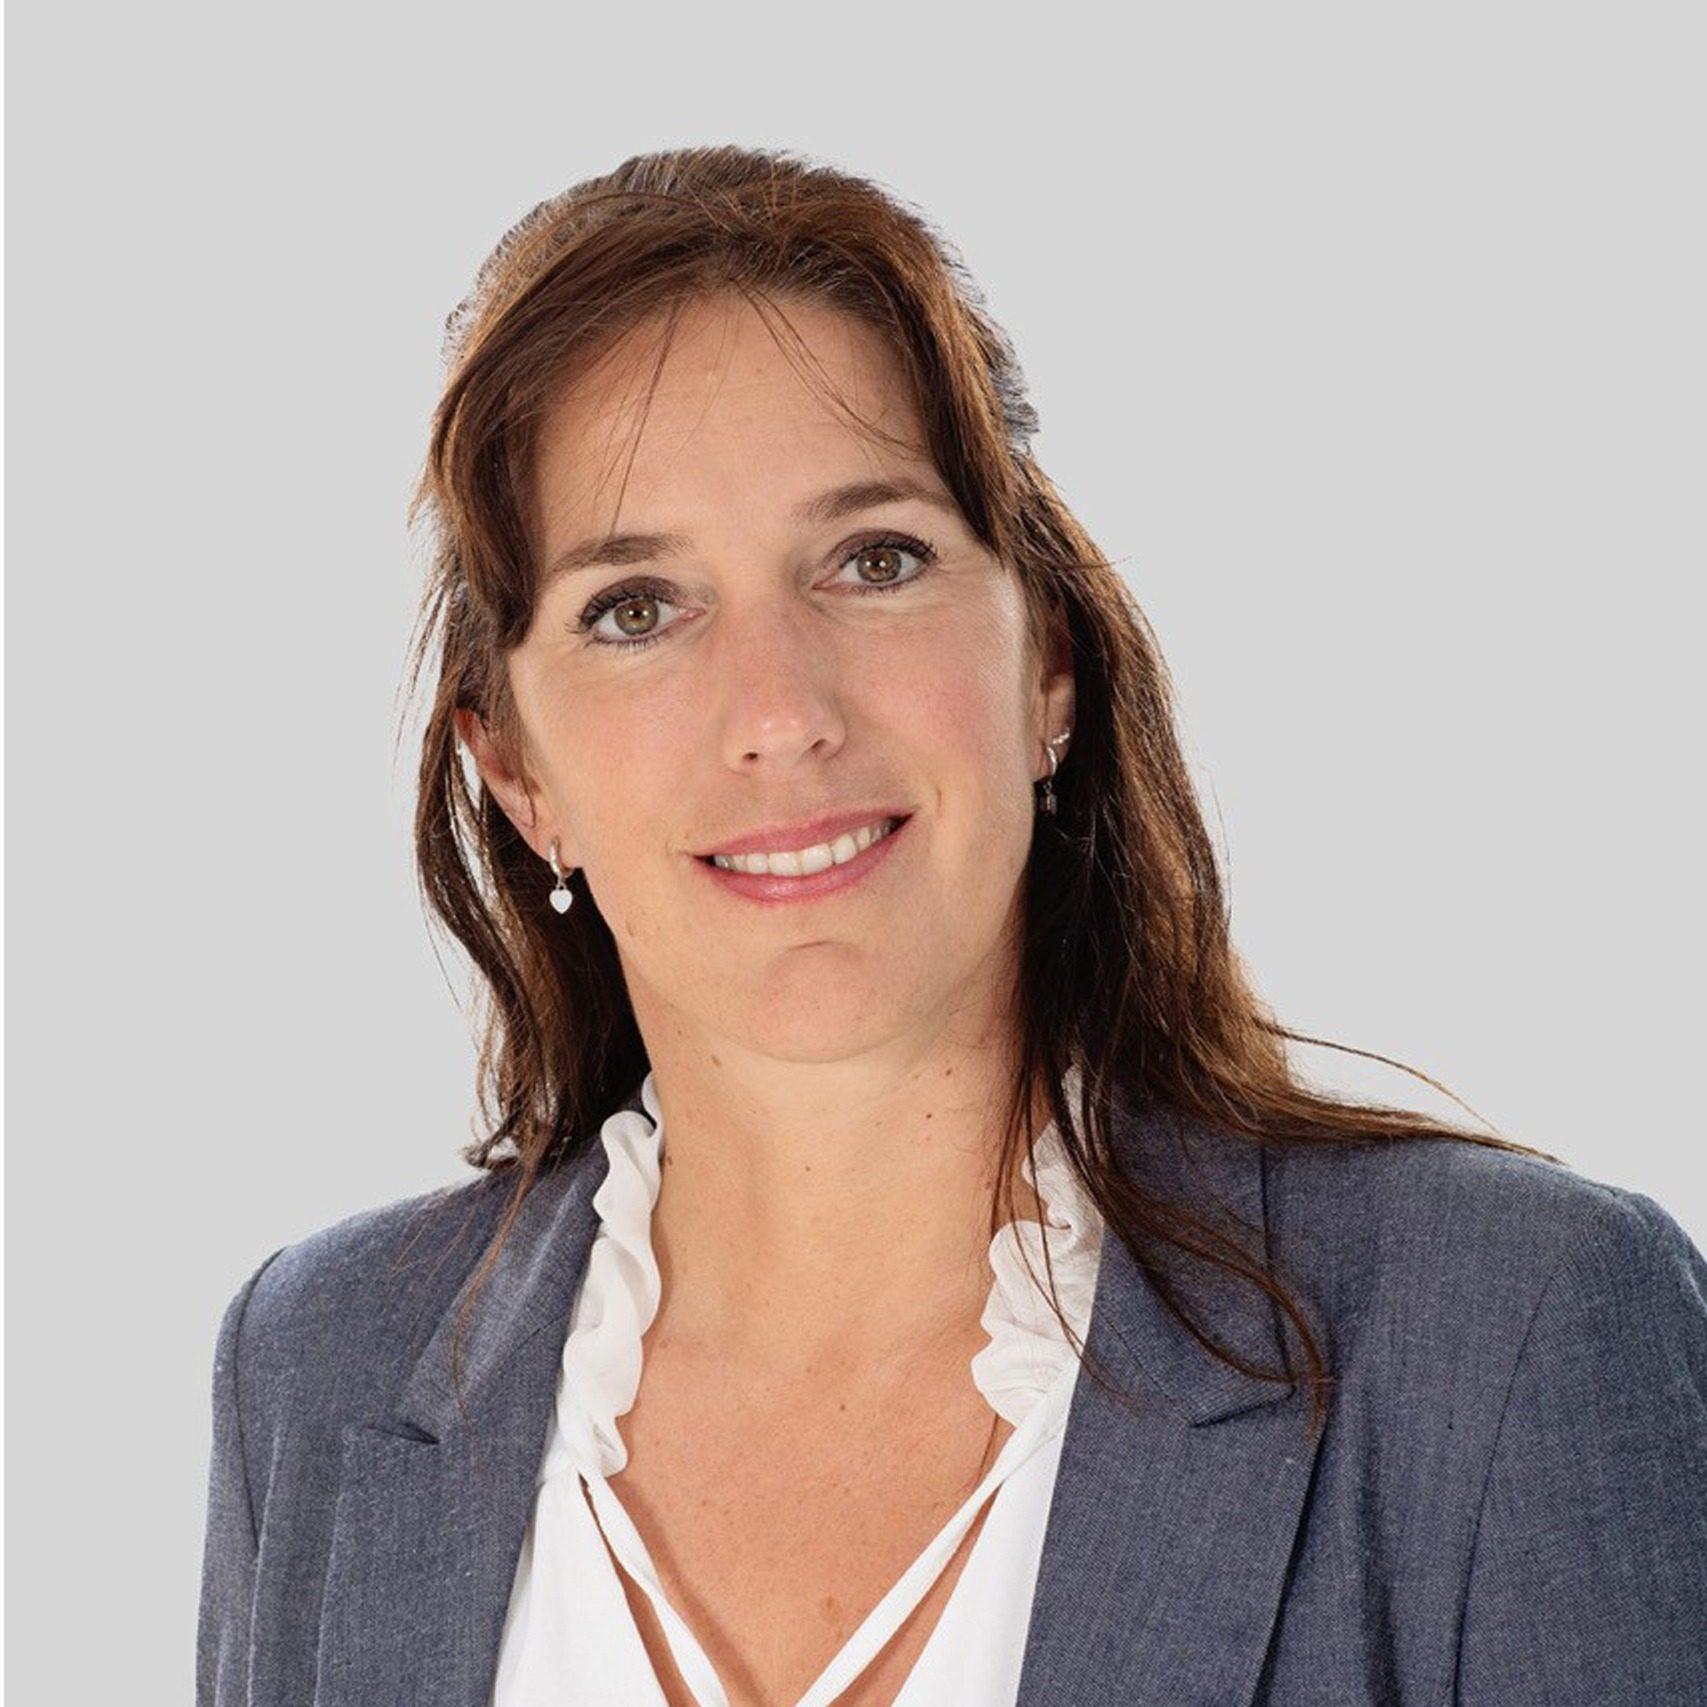 Linda-pijpers-been-management-consulting